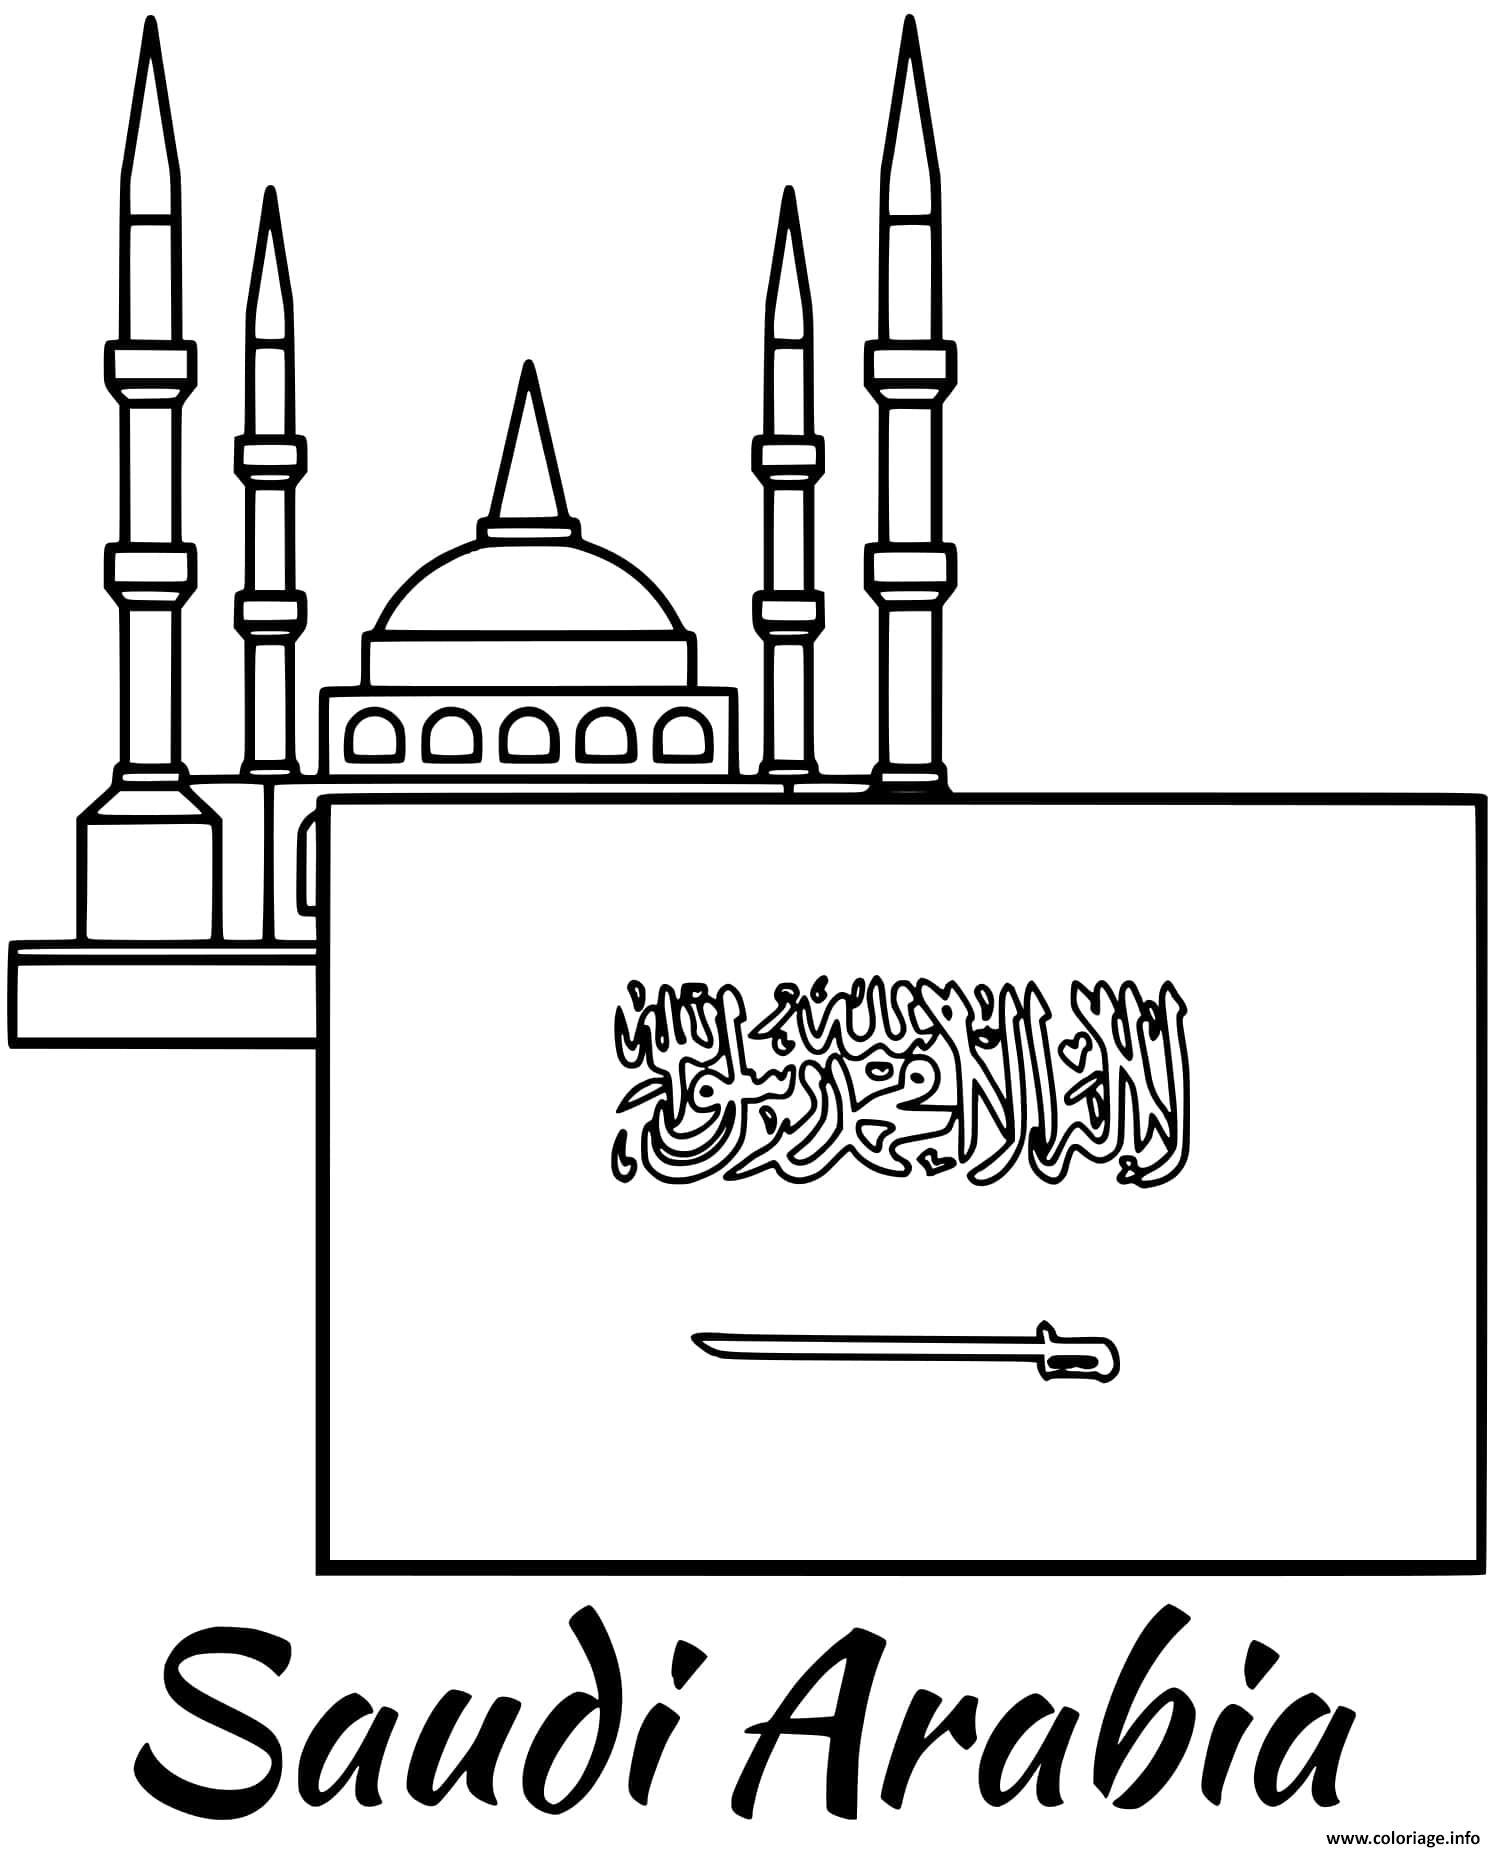 Dessin arabie saoudite drapeau mosque Coloriage Gratuit à Imprimer